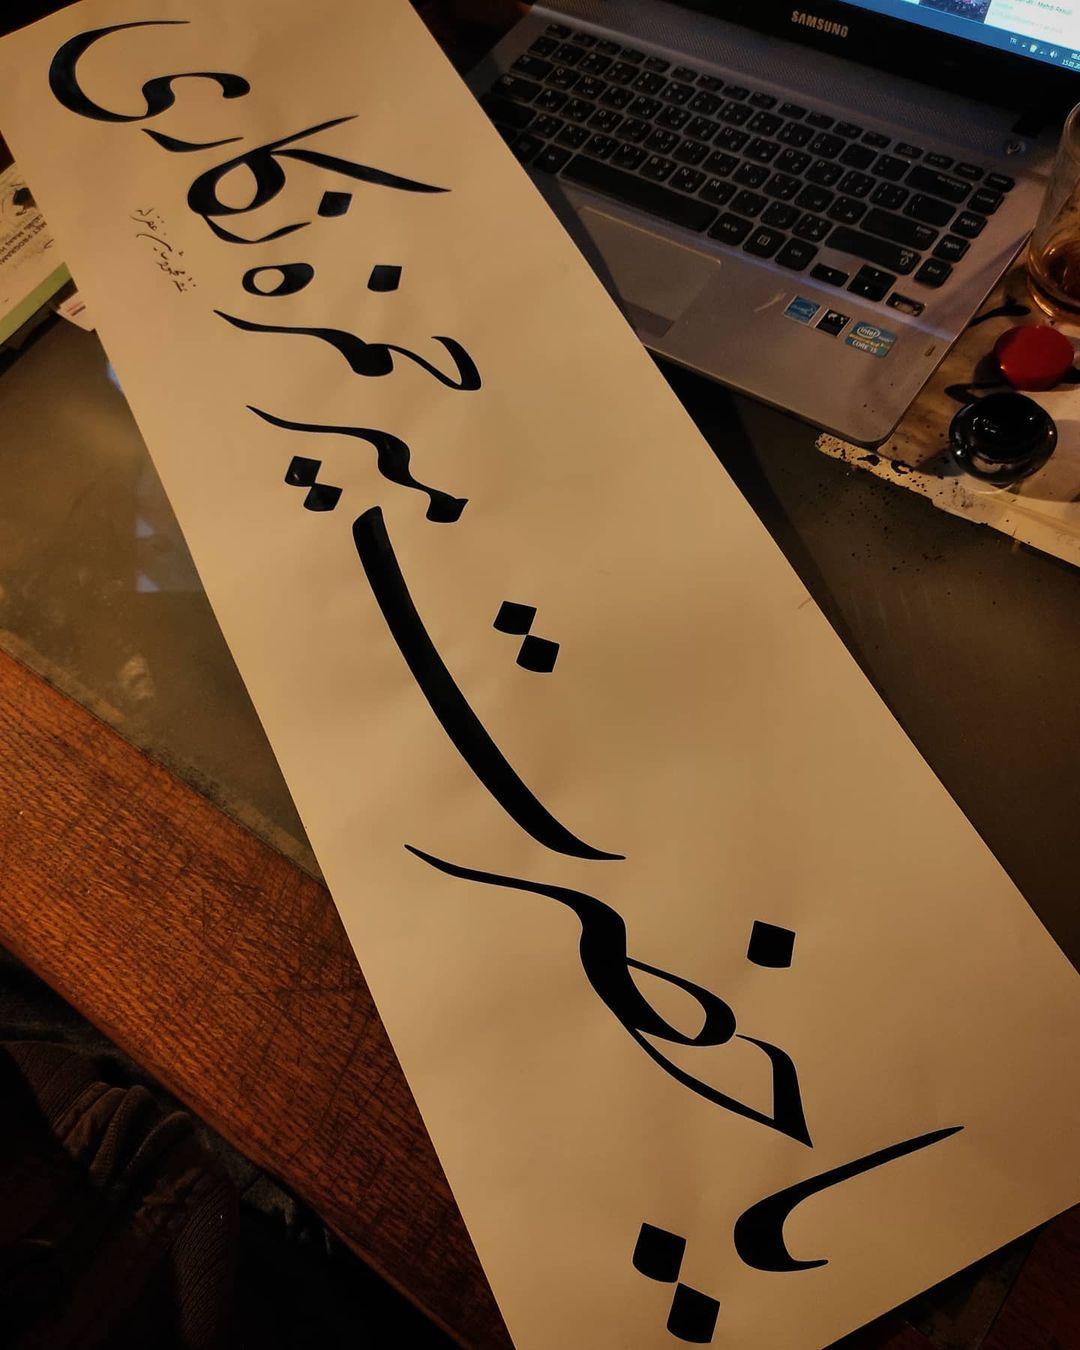 Donwload Photo Ya Hazreti Mir Hamza Nigari…. Amasyaya selam olsun cumanız mübarek olsun inşal…- Hattat Mahmud